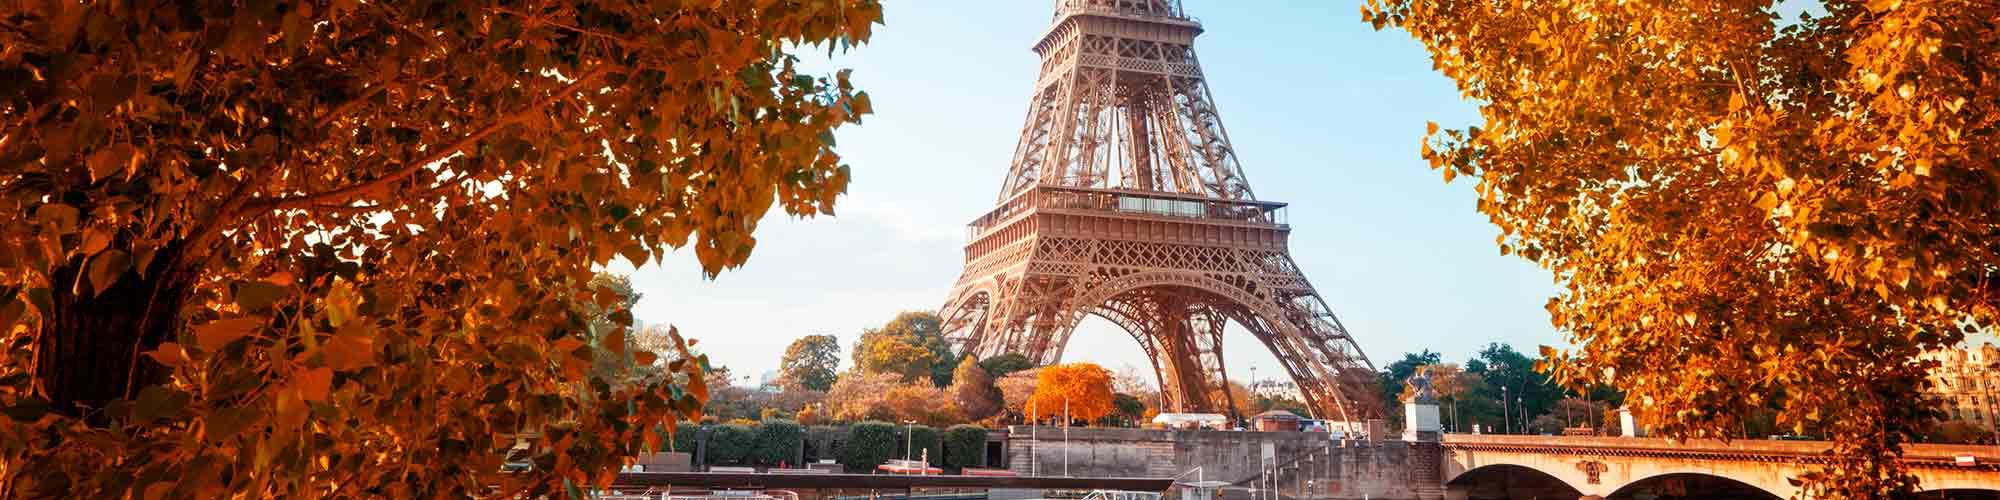 París de Cine - El Pais Viajes